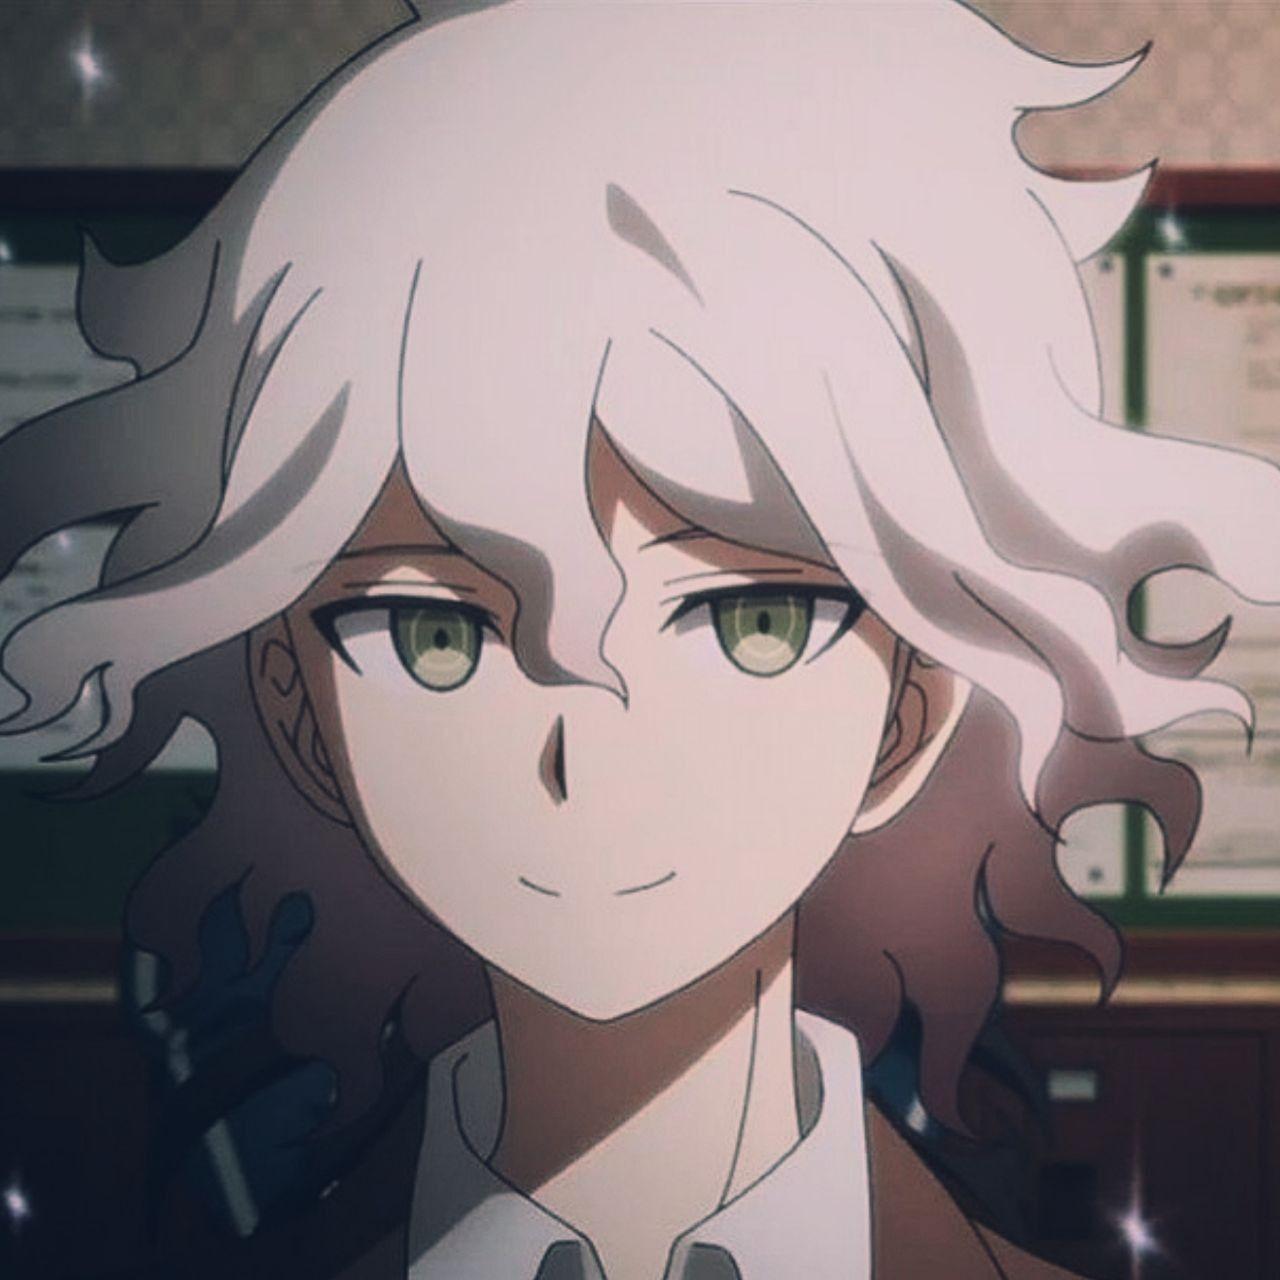 Nagito Komaeda Danganronpa, Danganronpa characters